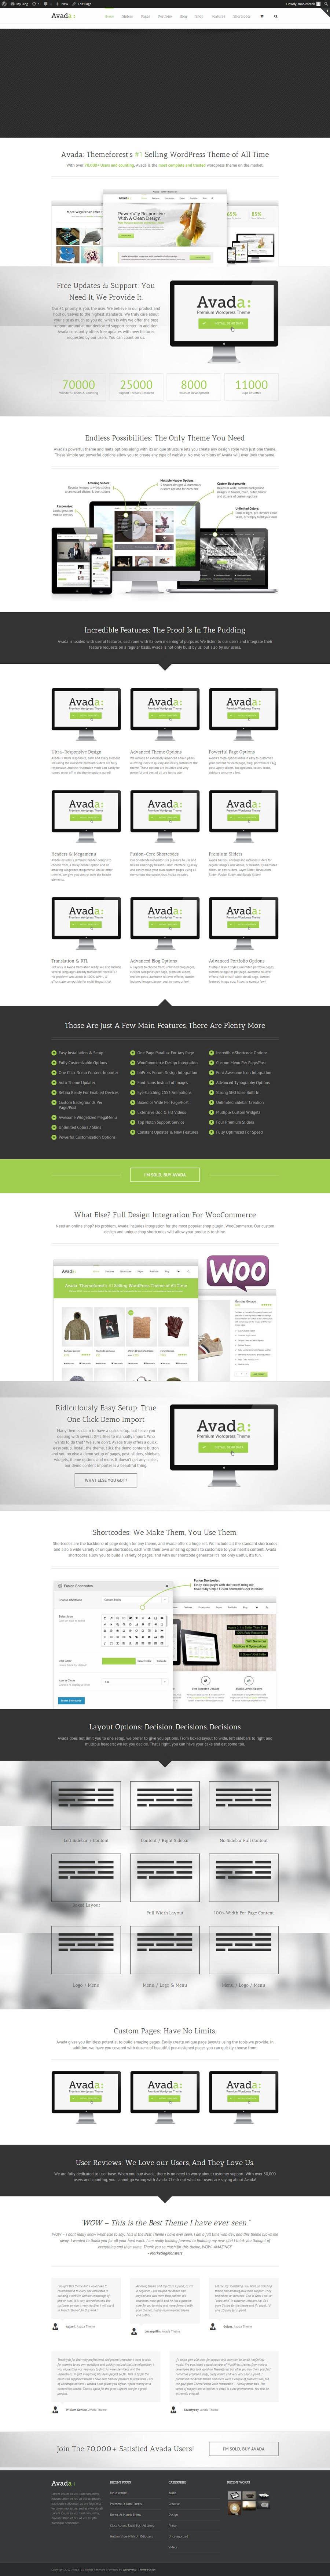 Penyertaan Peraduan #                                        4                                      untuk                                         redesign website www.GadgetsClinic.com